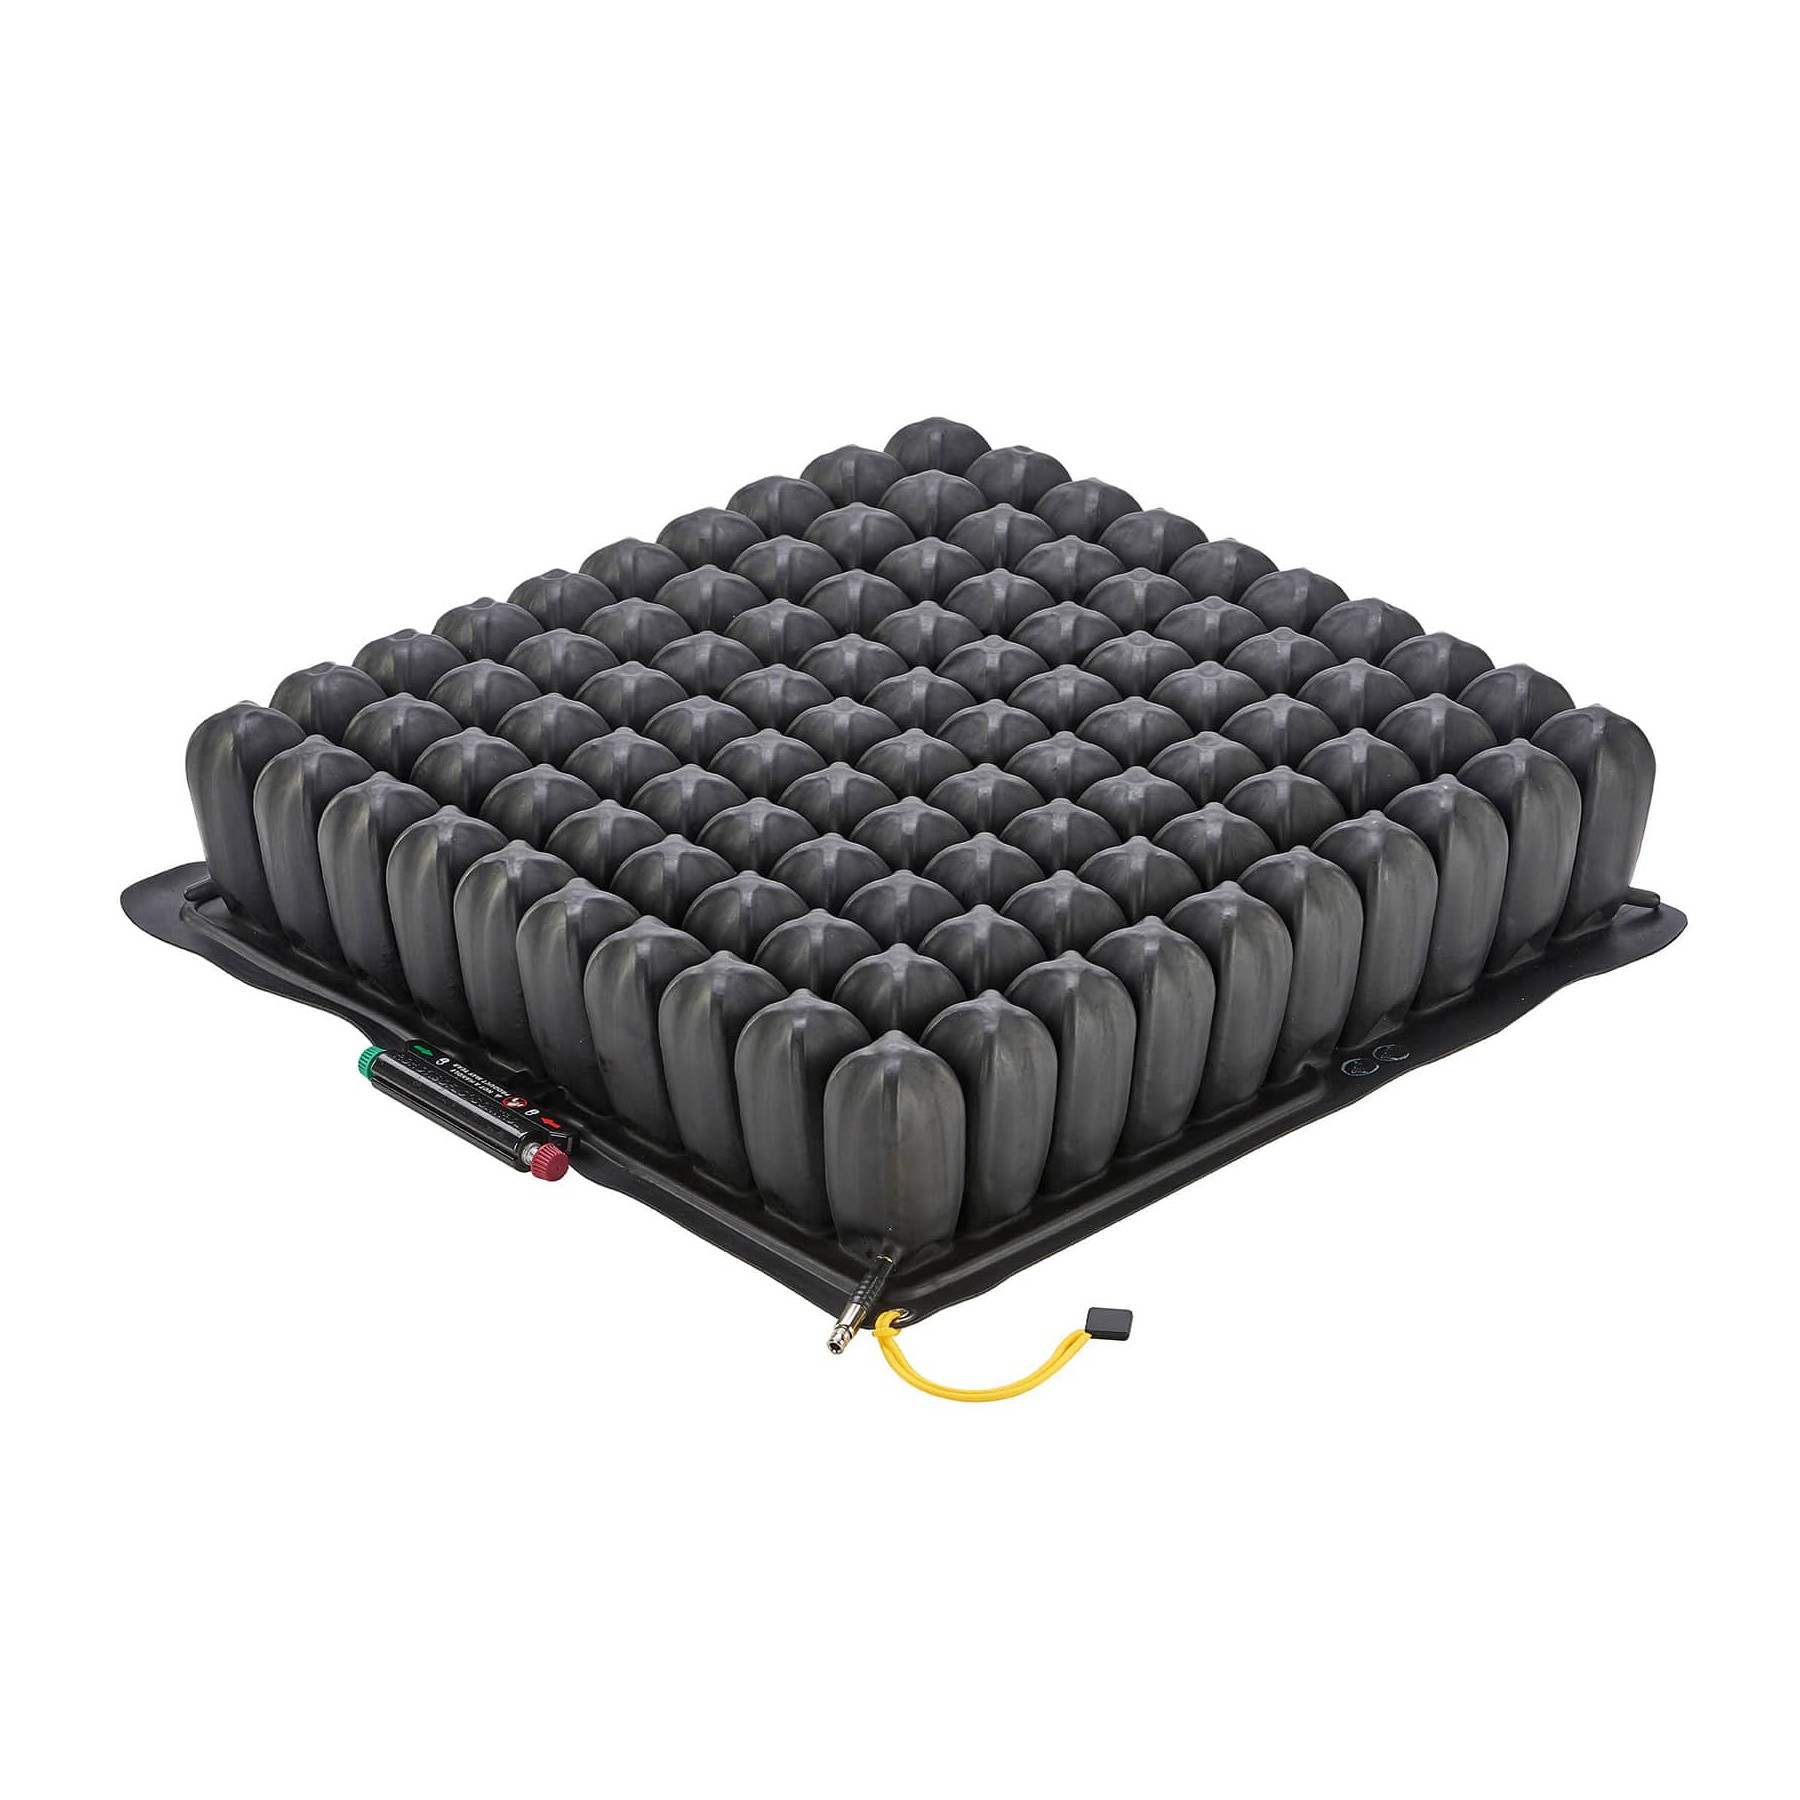 Black ROHO Quadtro Select High Profile Cushion Cells